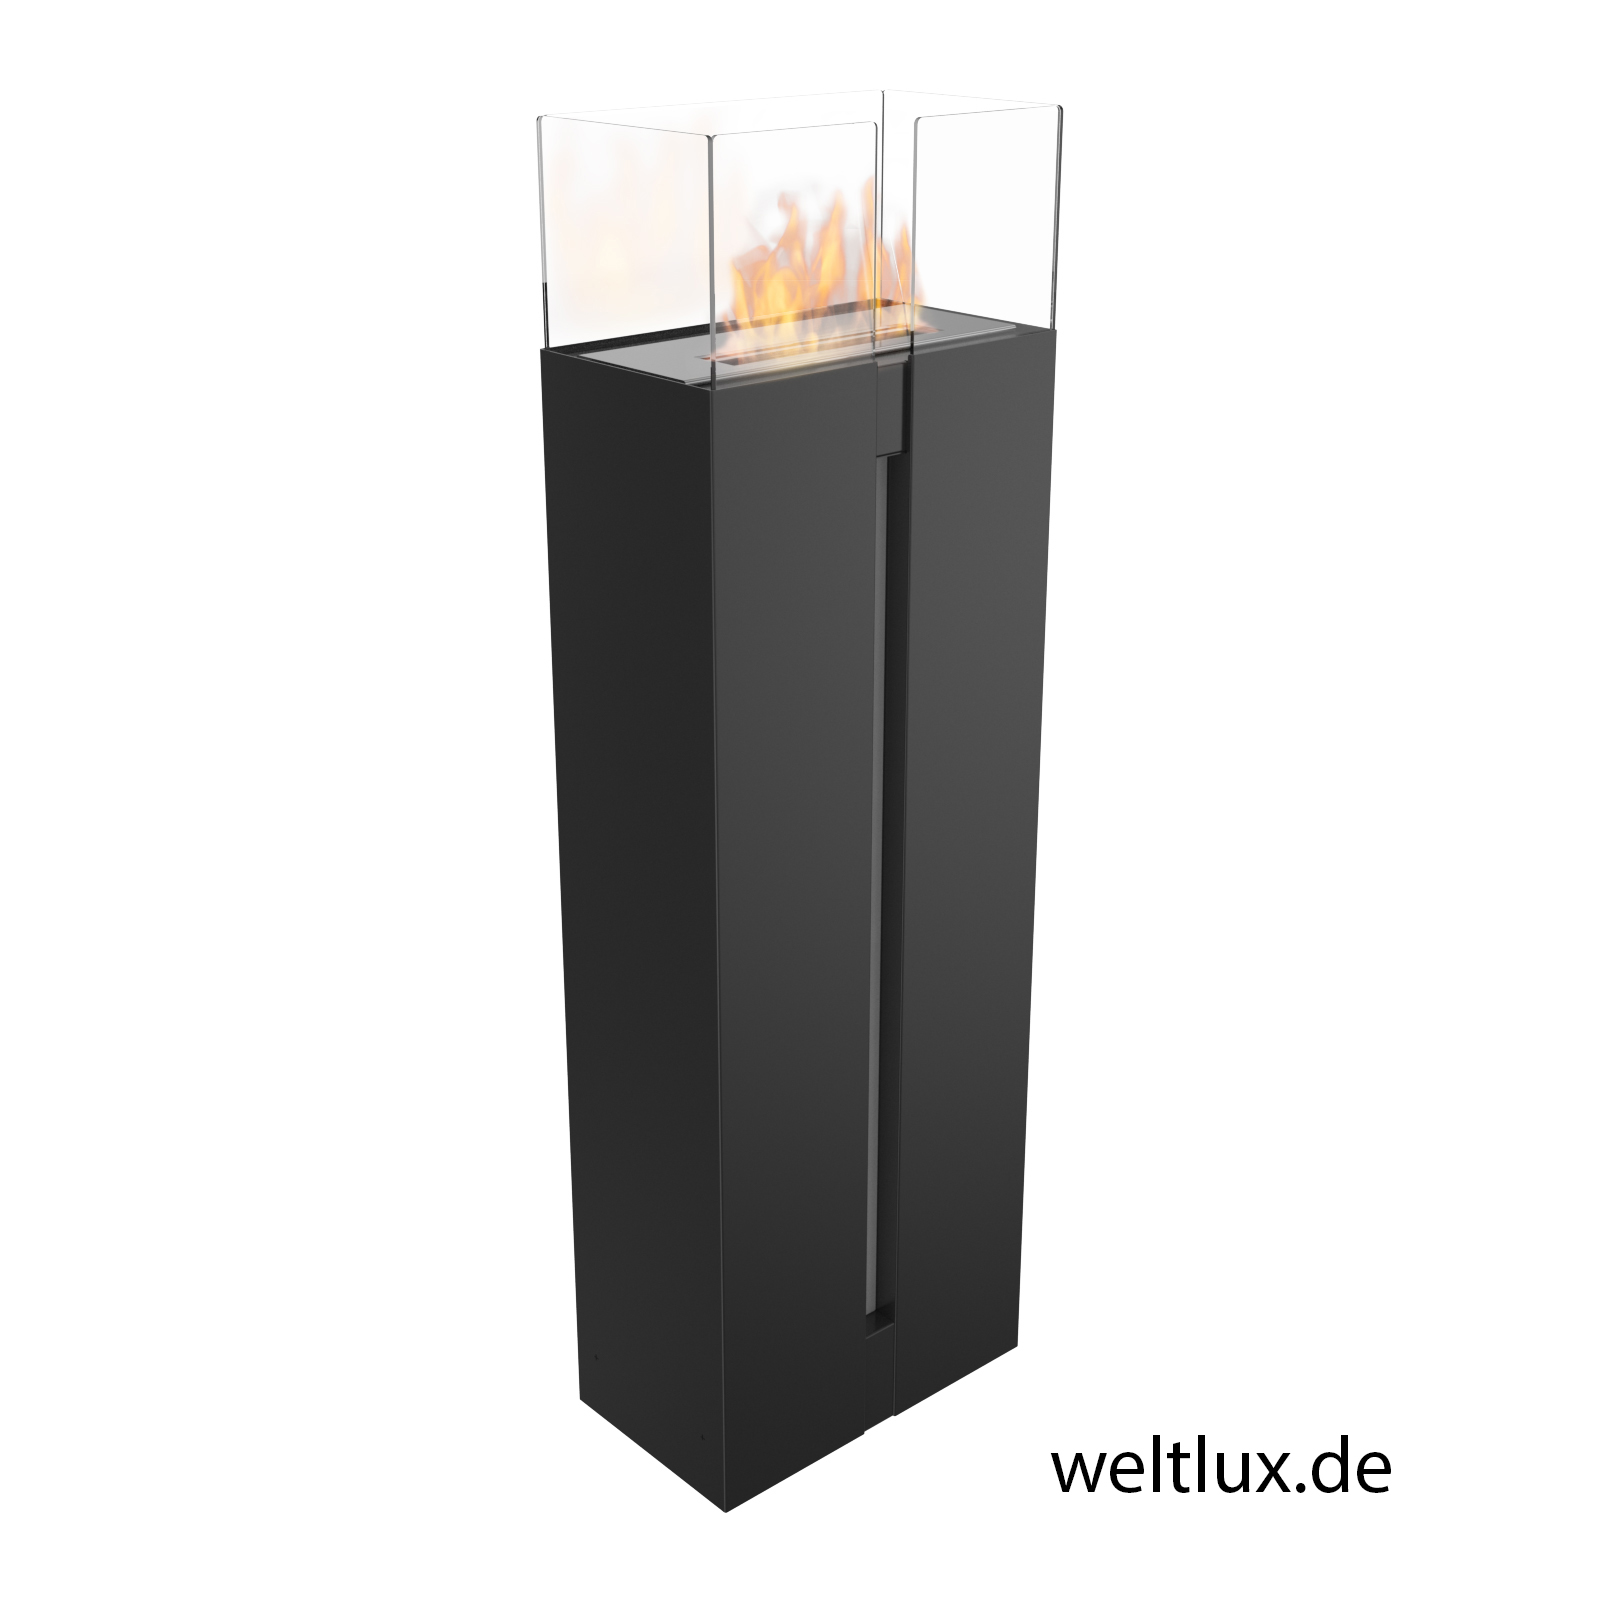 biokamin feuerstelle bio ethanol kamin bioethanol chemin e stahl mit glas neu ebay. Black Bedroom Furniture Sets. Home Design Ideas